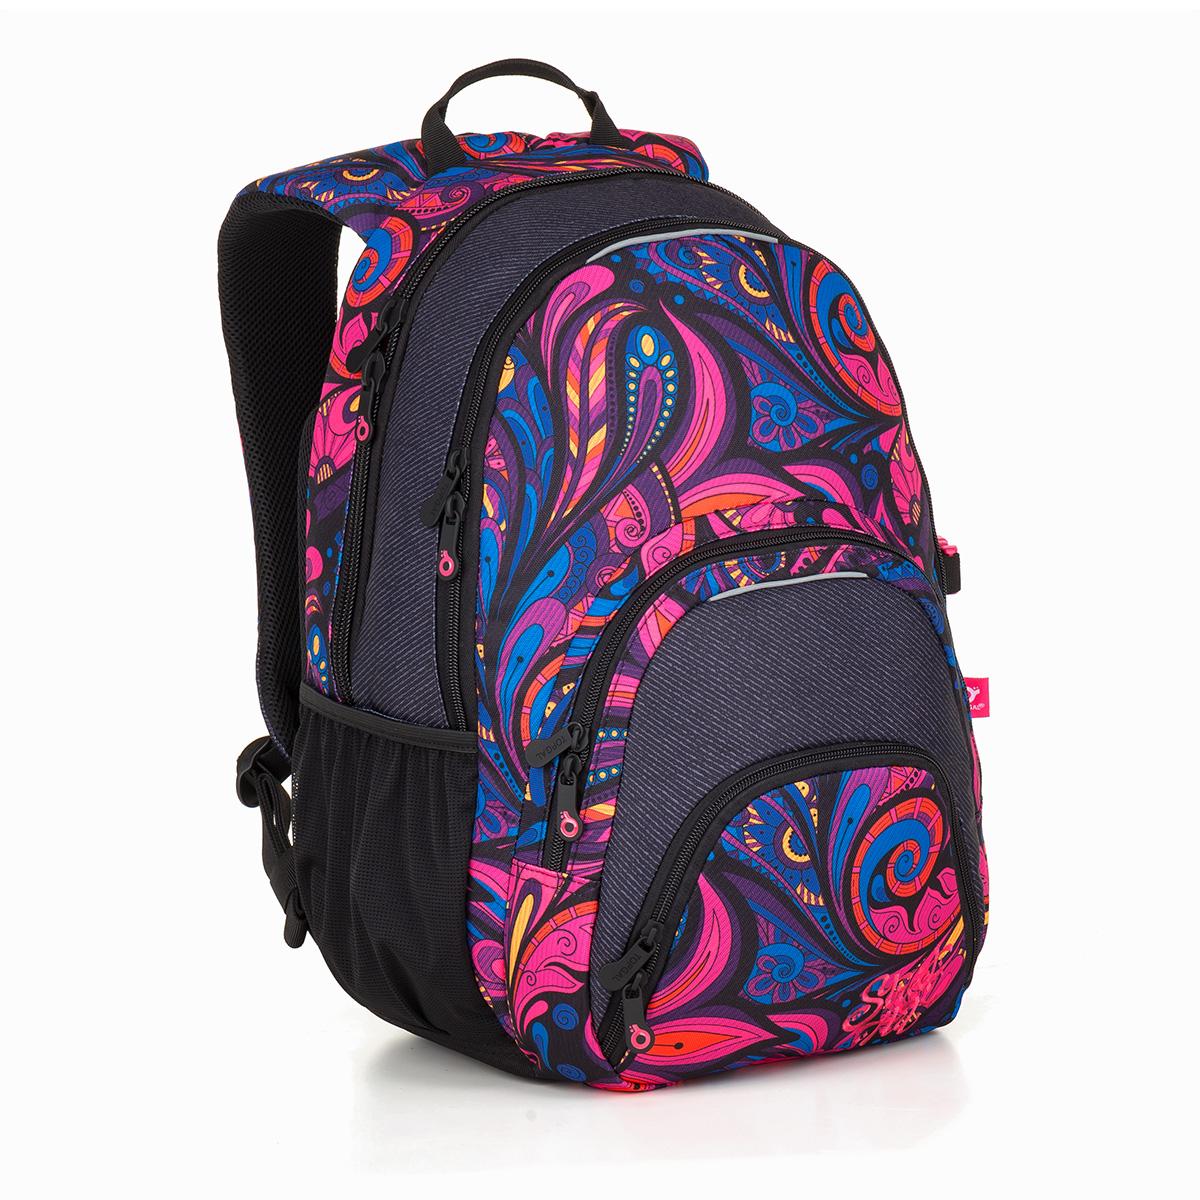 Studentský batoh Topgal SIAN 18031 G